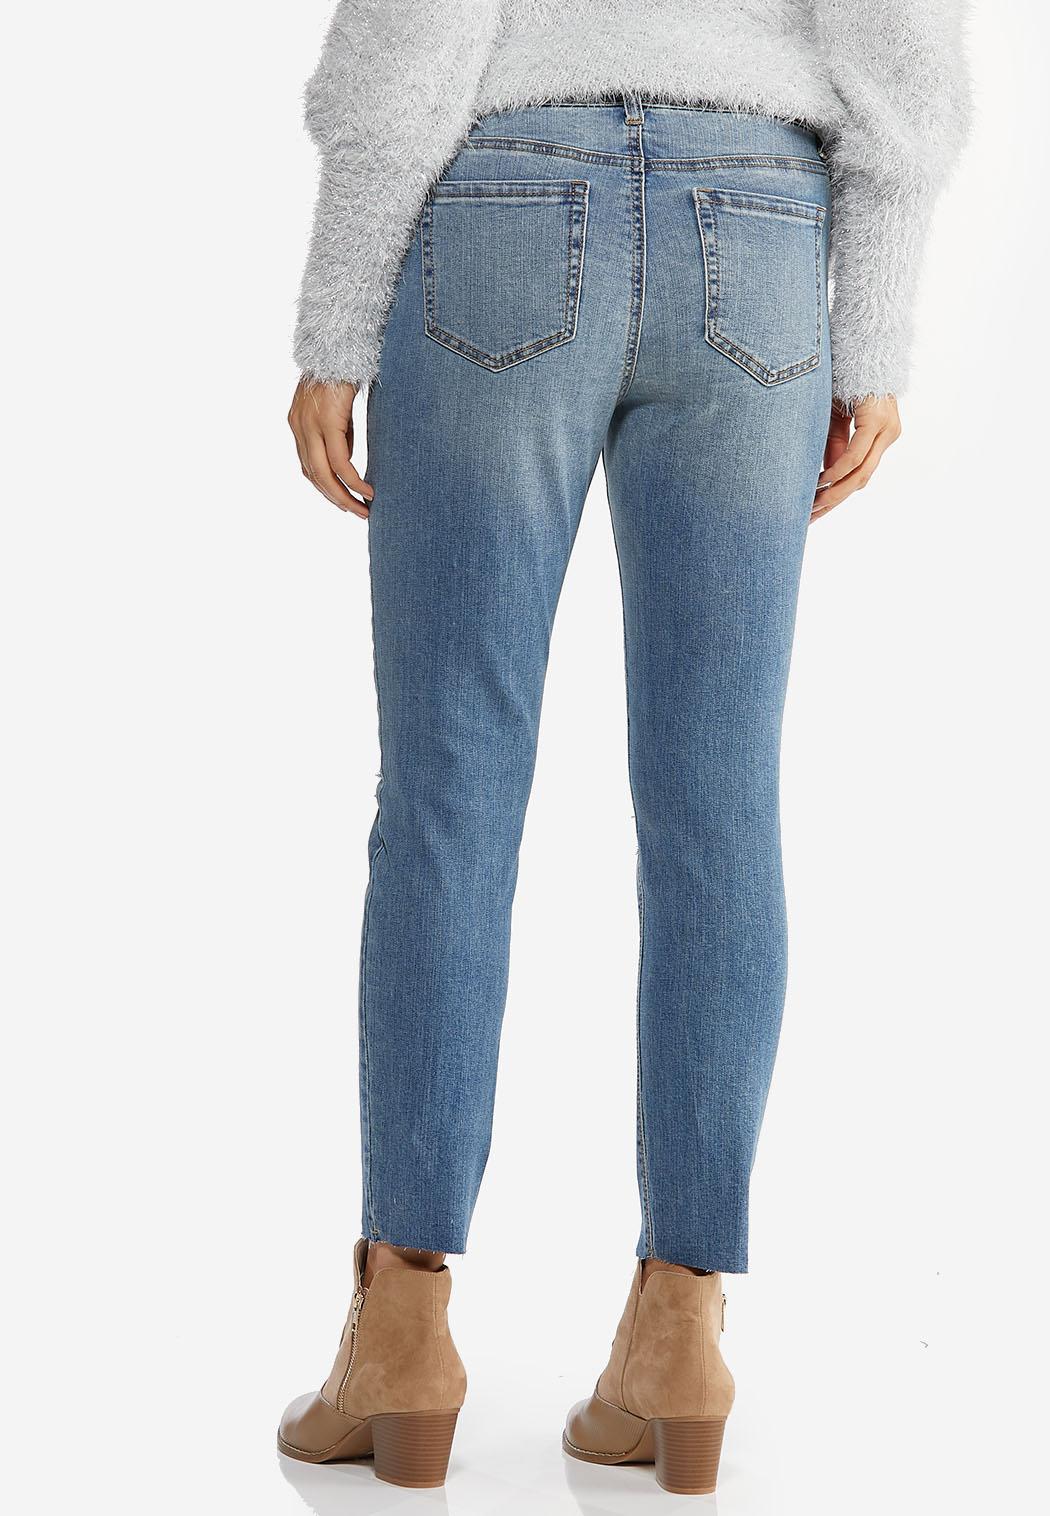 Distressed Skinny Ankle Jeans (Item #44427341)